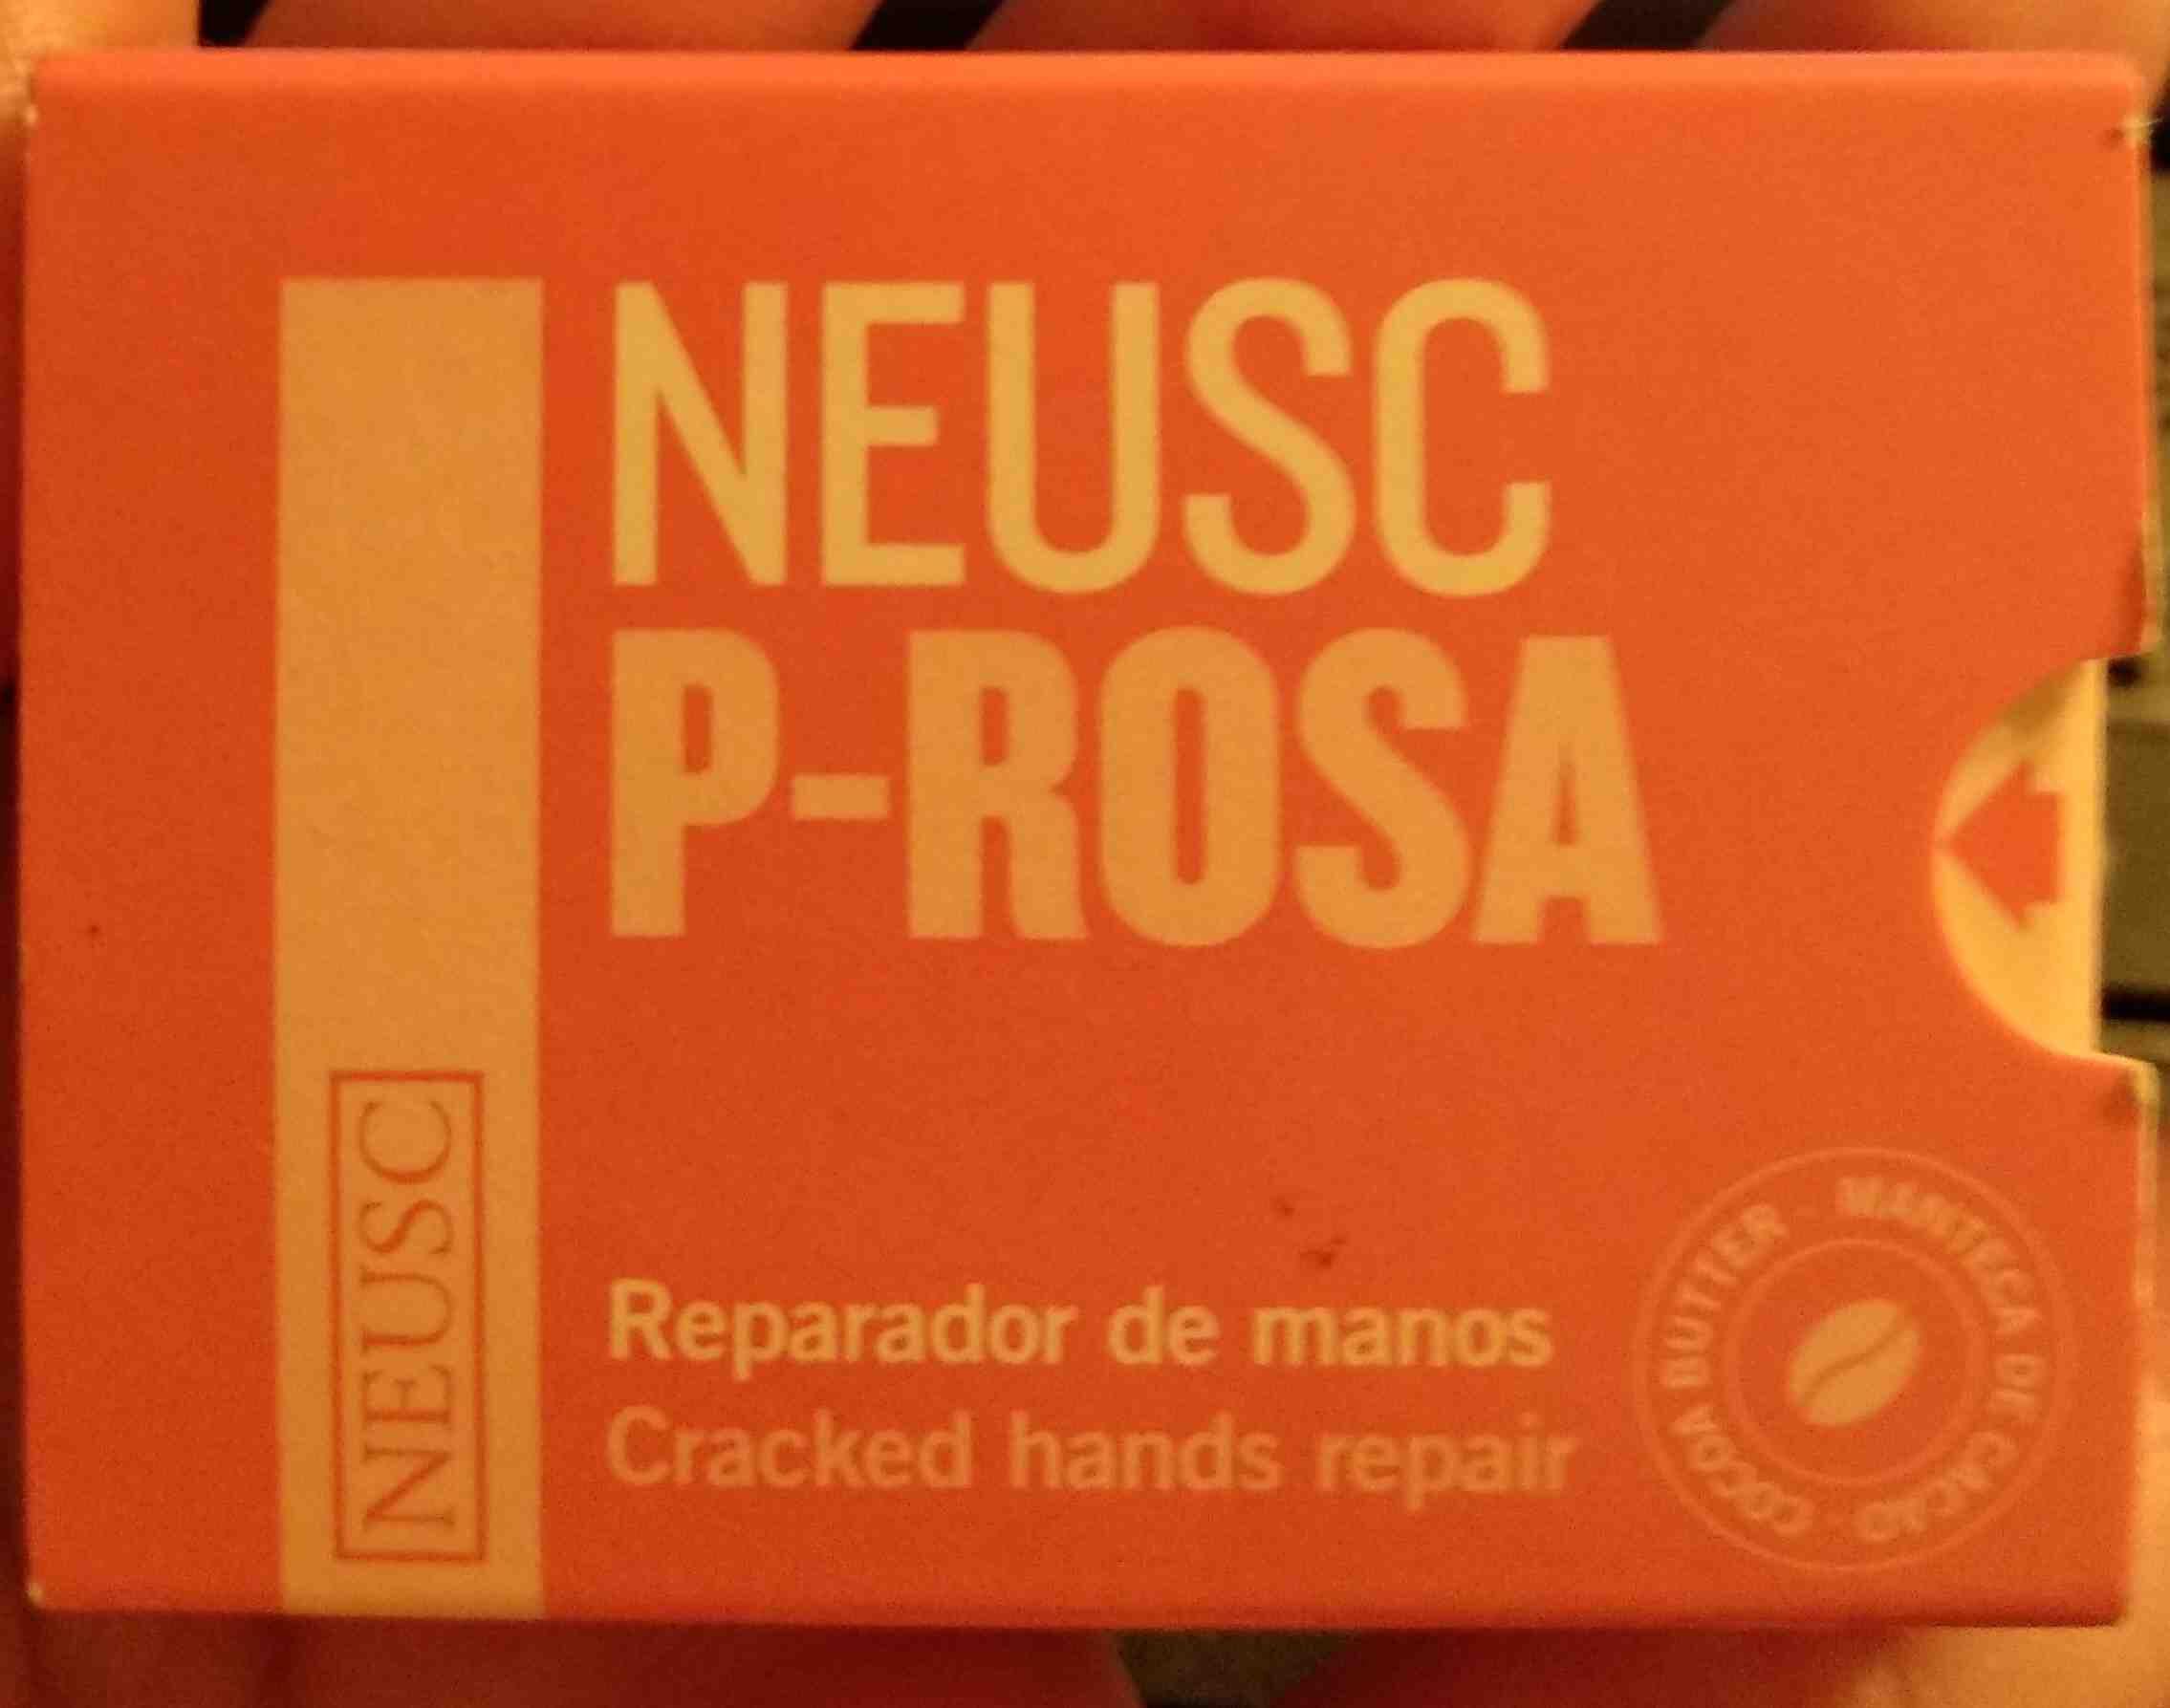 NEUSC P-ROSA Reparador de manos - Product - en